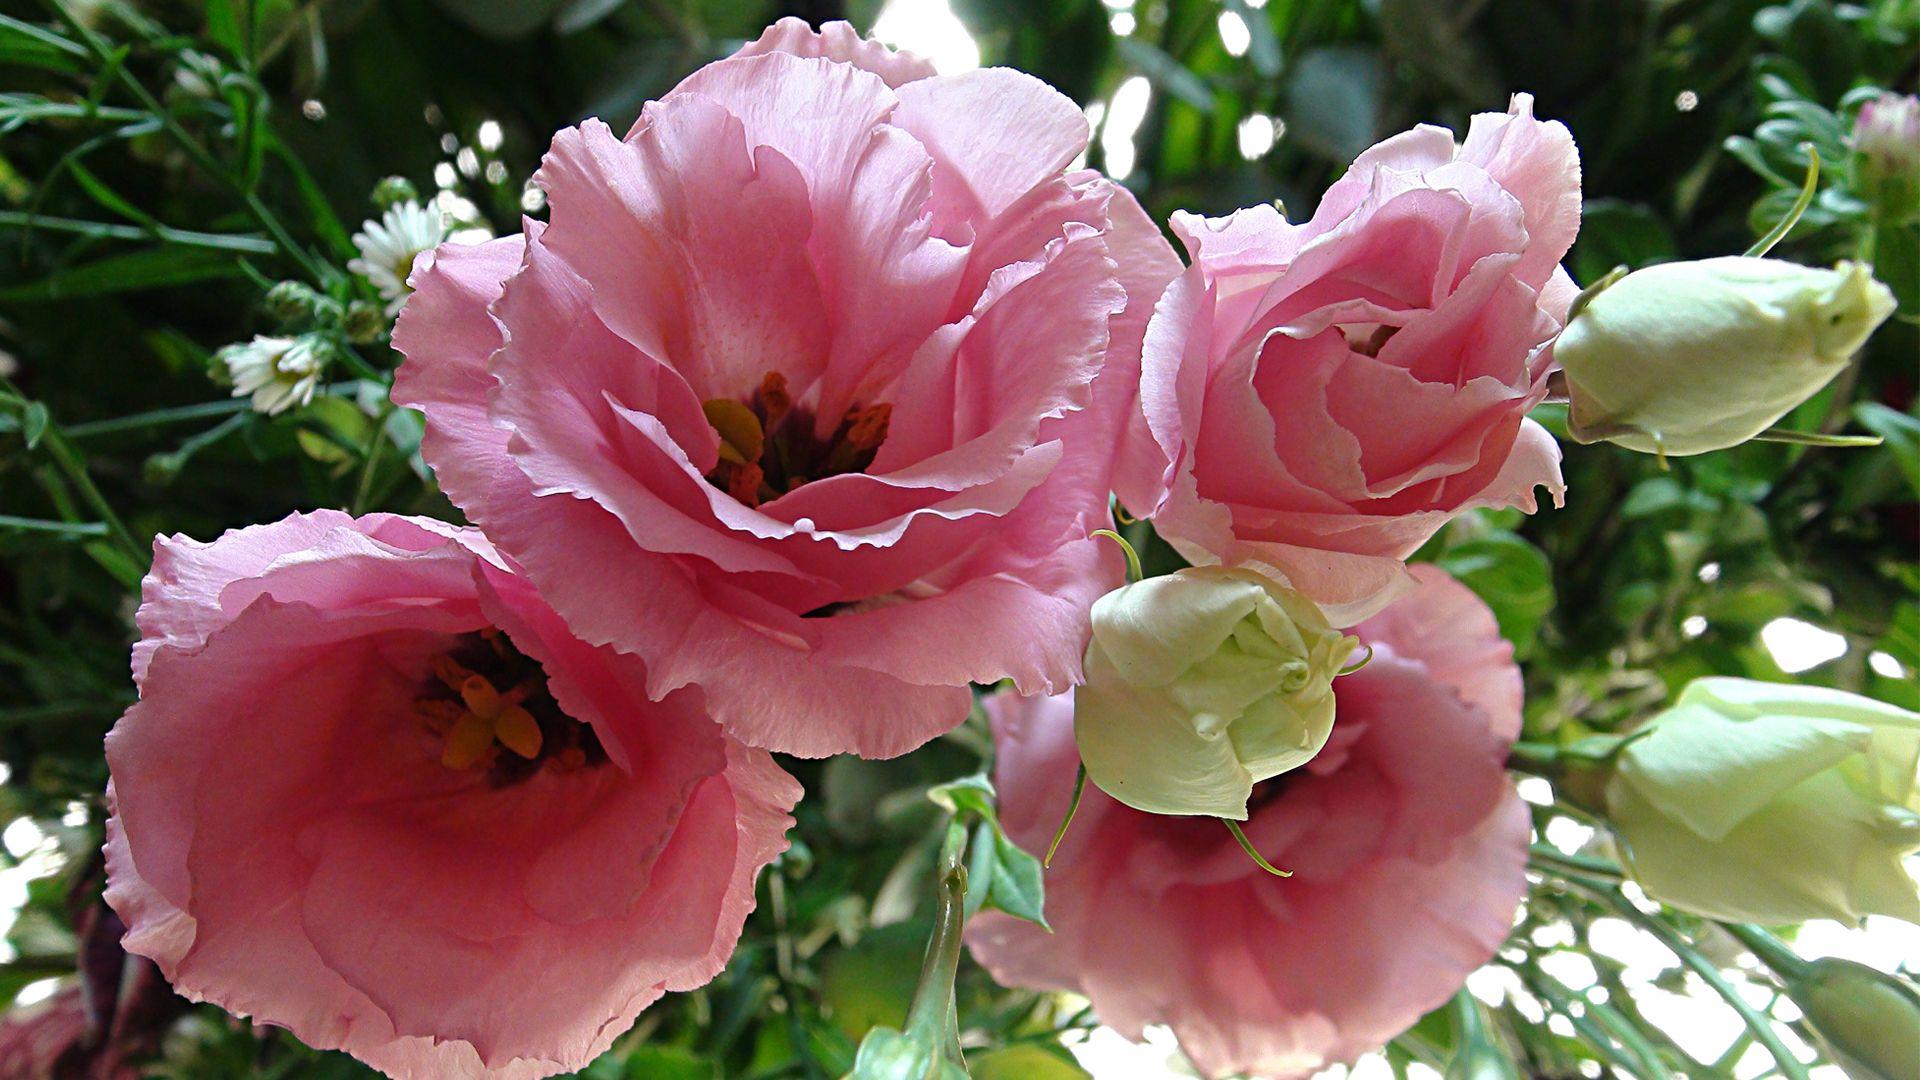 Lisianthus - flowers that look like roses | Flower Wallpapers | Lisianthus flowers, Flowers ...